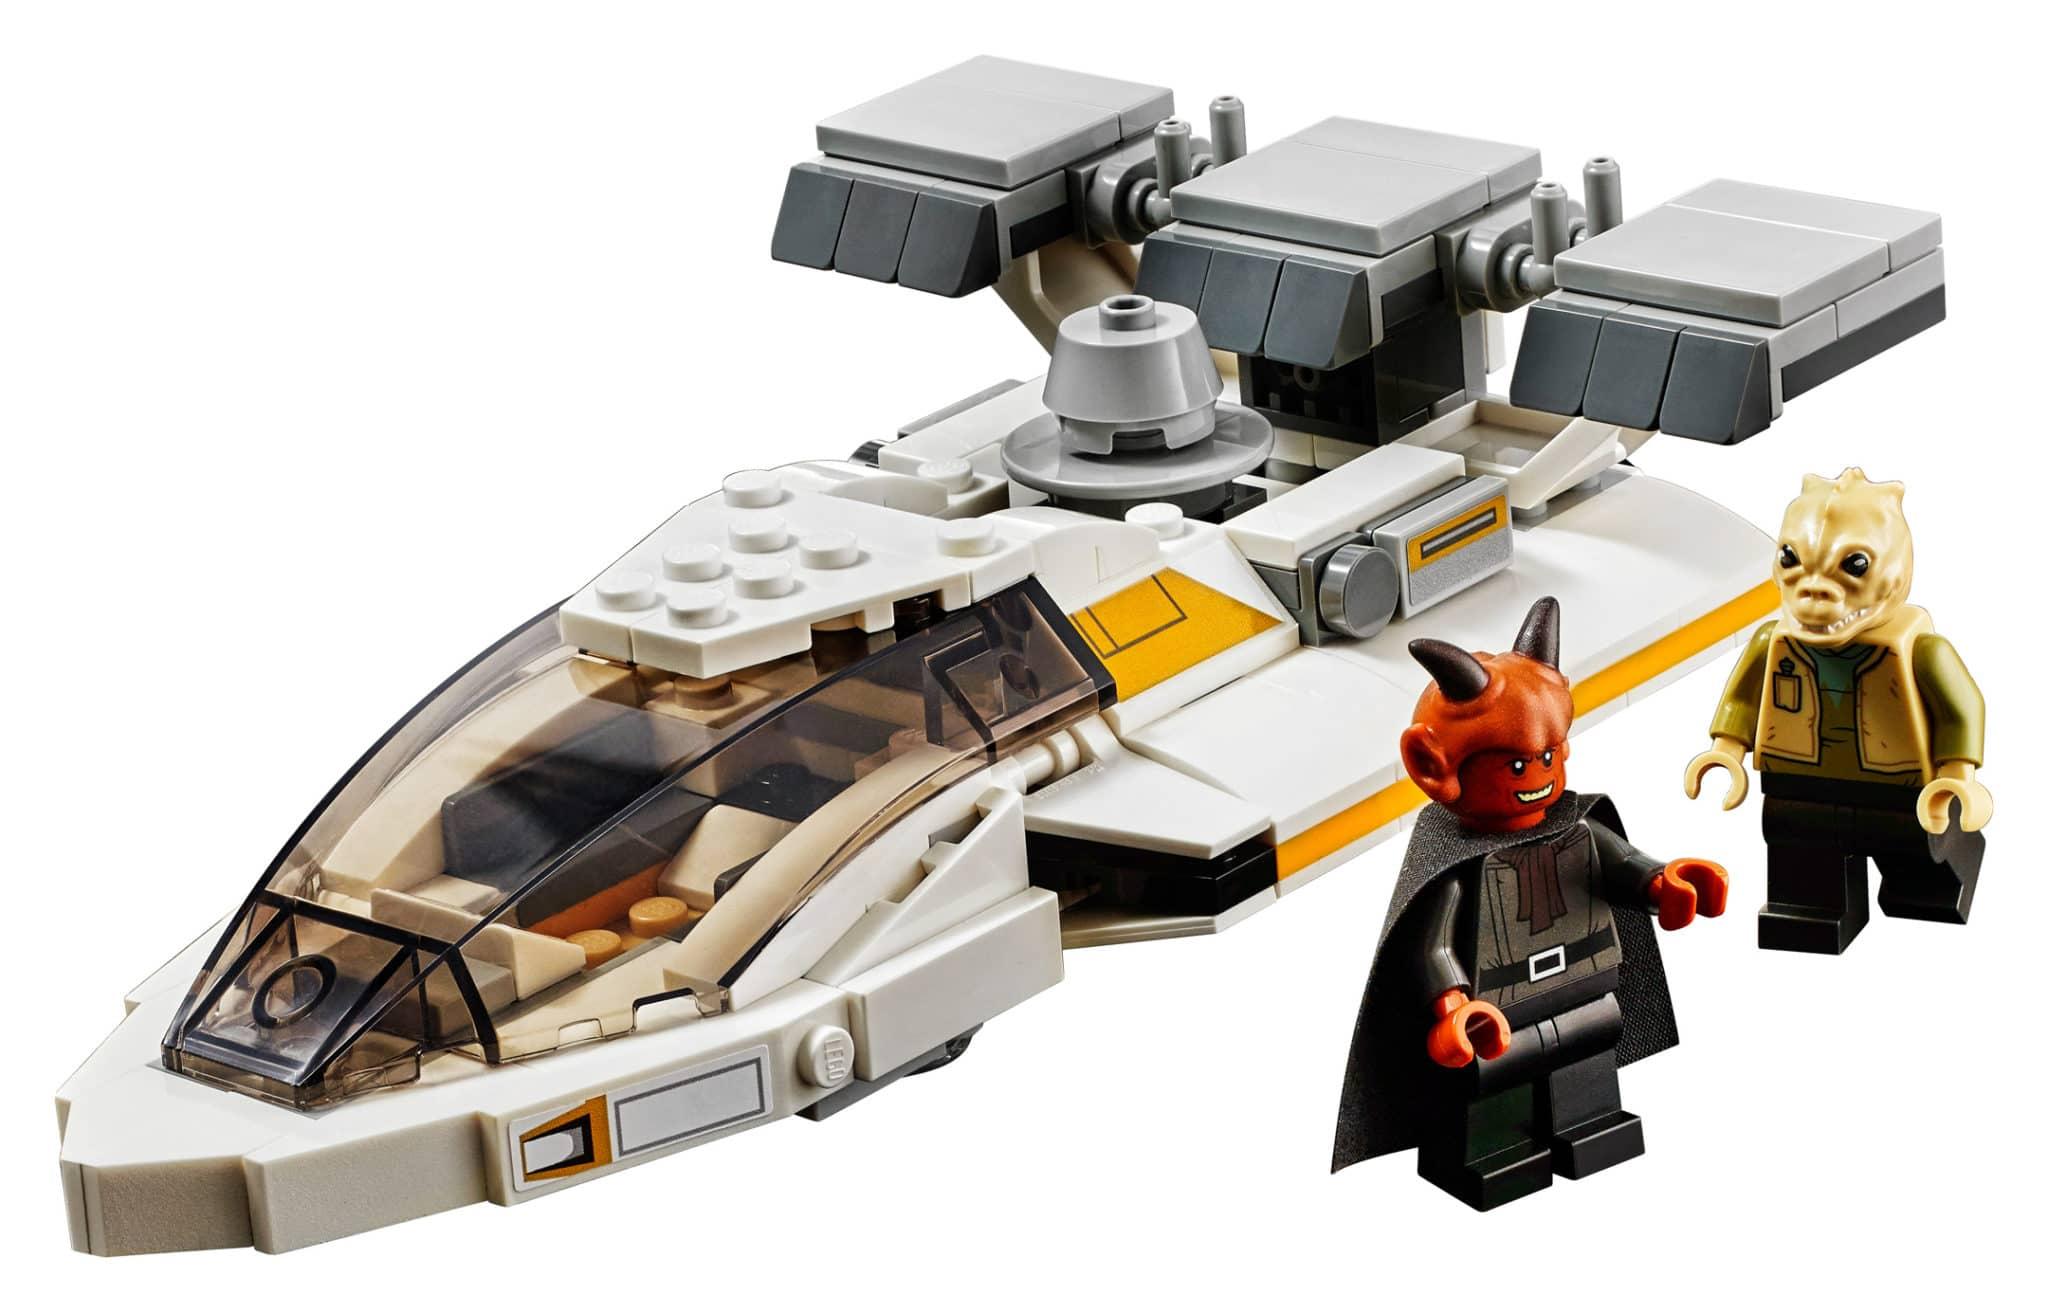 LEGO Star Wars 75290 Mos Eisley Cantina Landspeeder